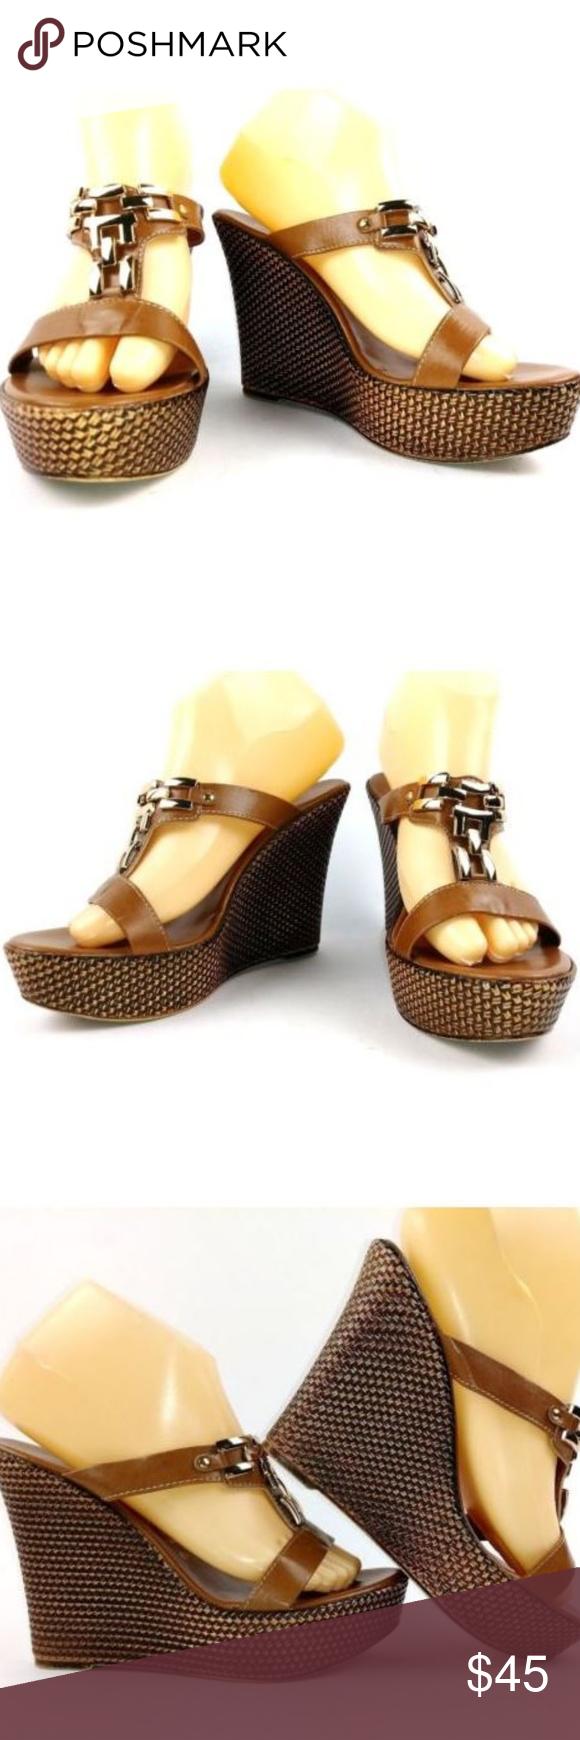 9cefd0bf0c9 Italian Shoemaker Contesa Wedge Sandal Size 39 Italian Shoemaker ...